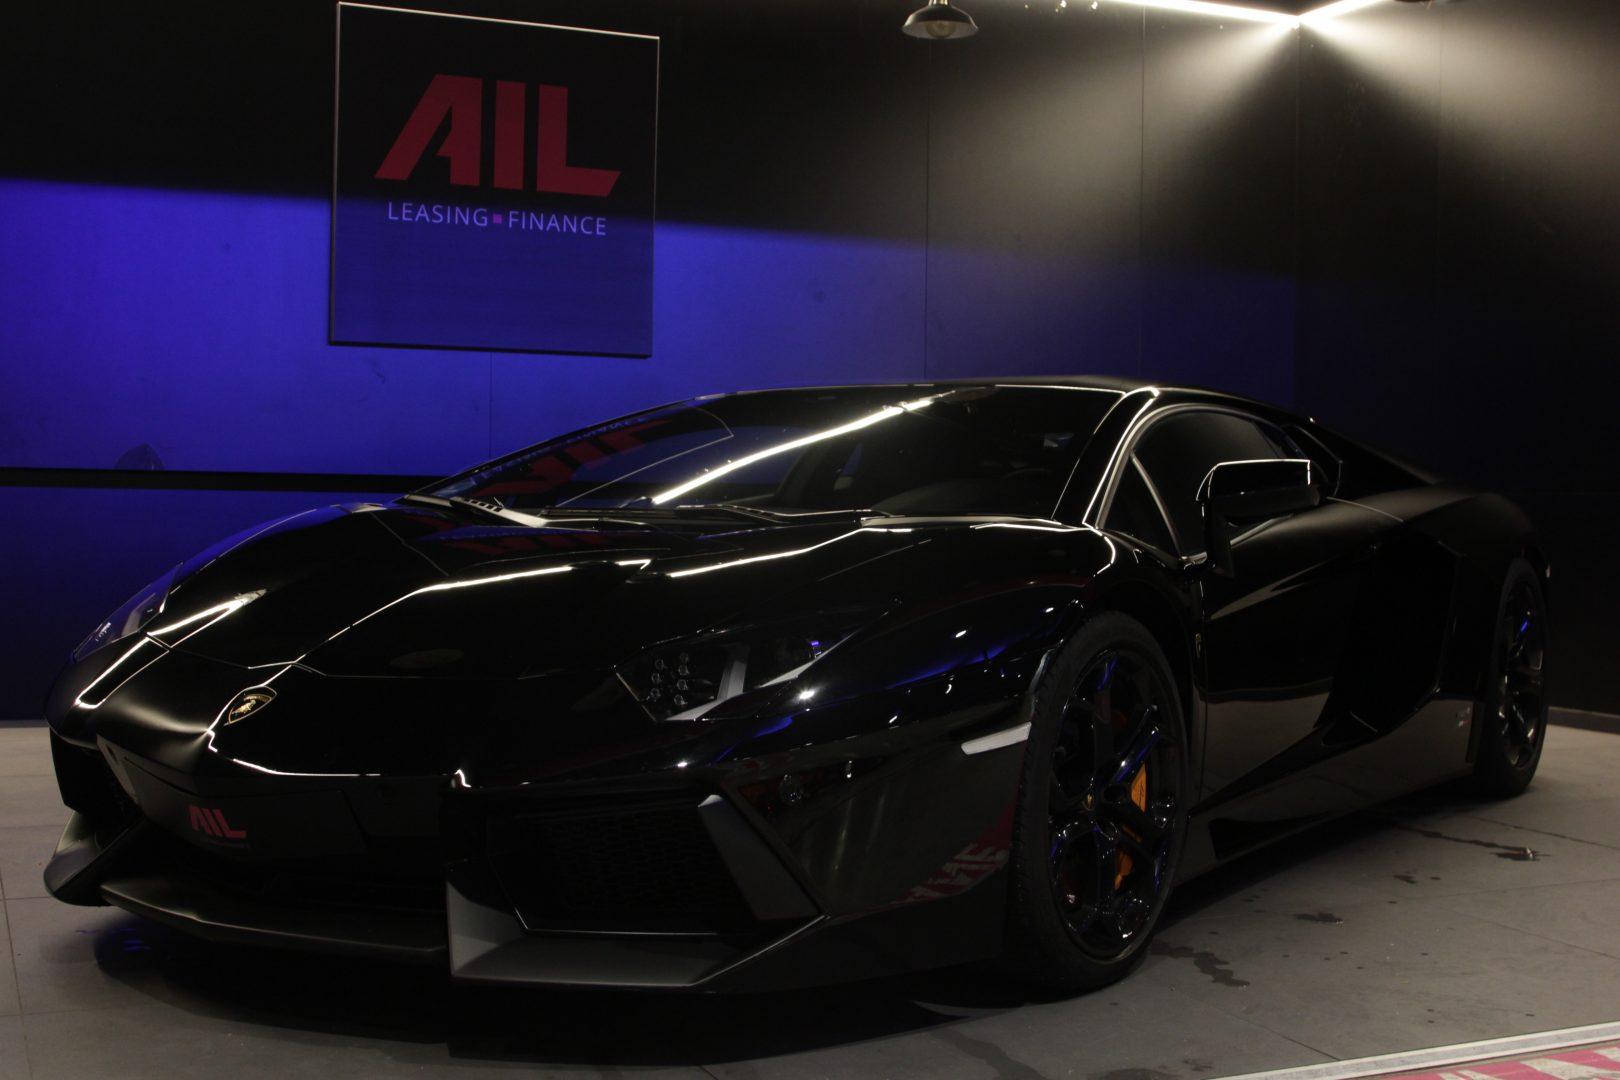 AIL Lamborghini Aventador LP 700-4 5